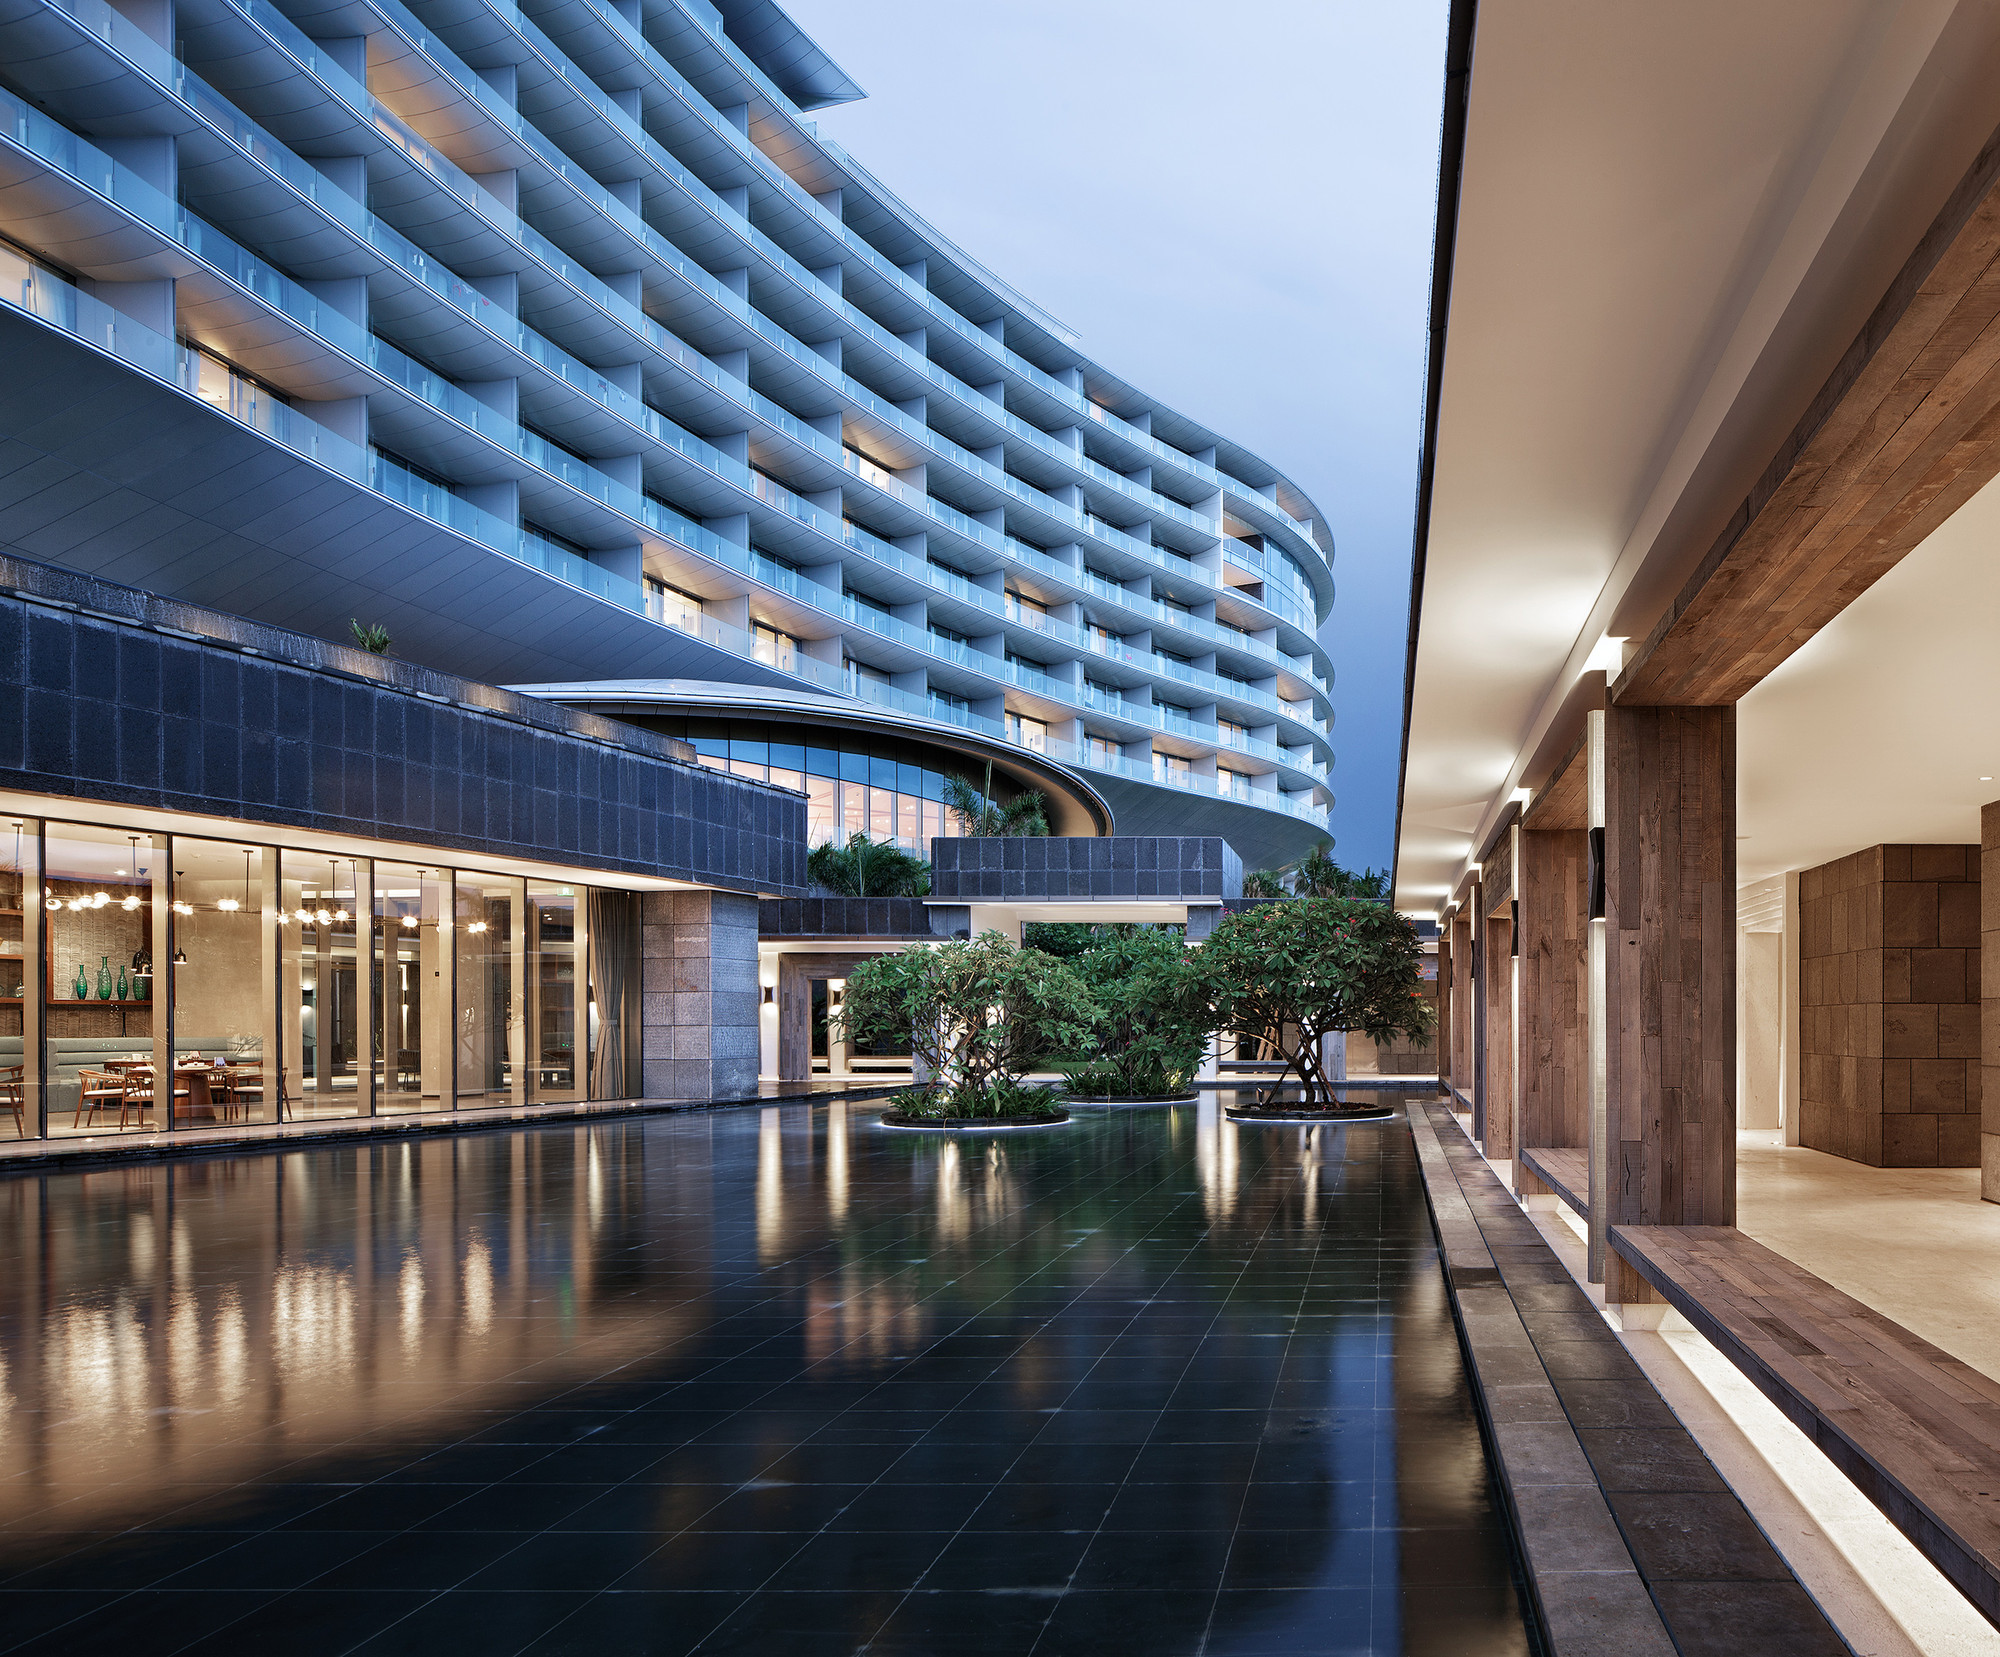 Gallery of hainan blue bay westin resort hotel gad for Resort hotel design